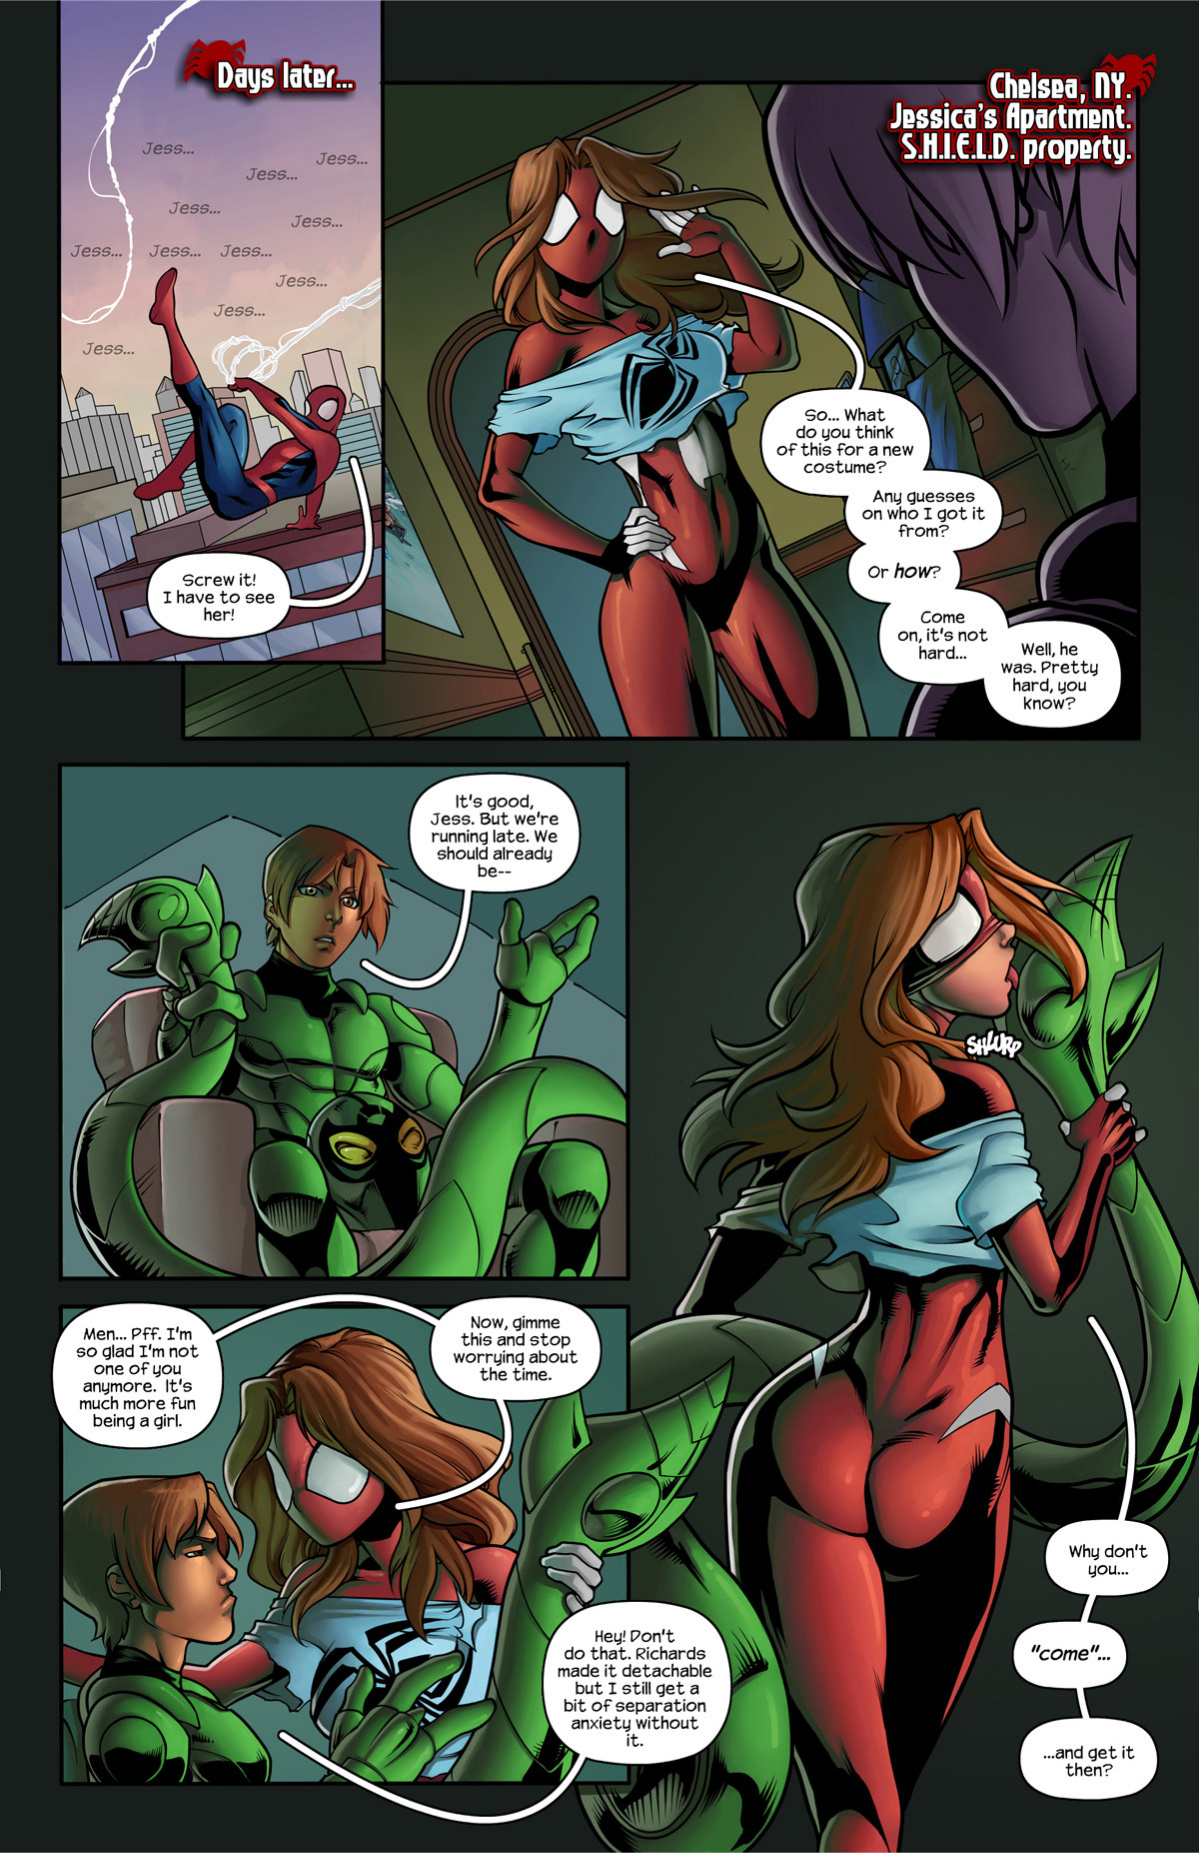 Ultimate Spider-Man XXX 11 - Spidercest porn comics Oral sex, Anal Sex, Double Penetration